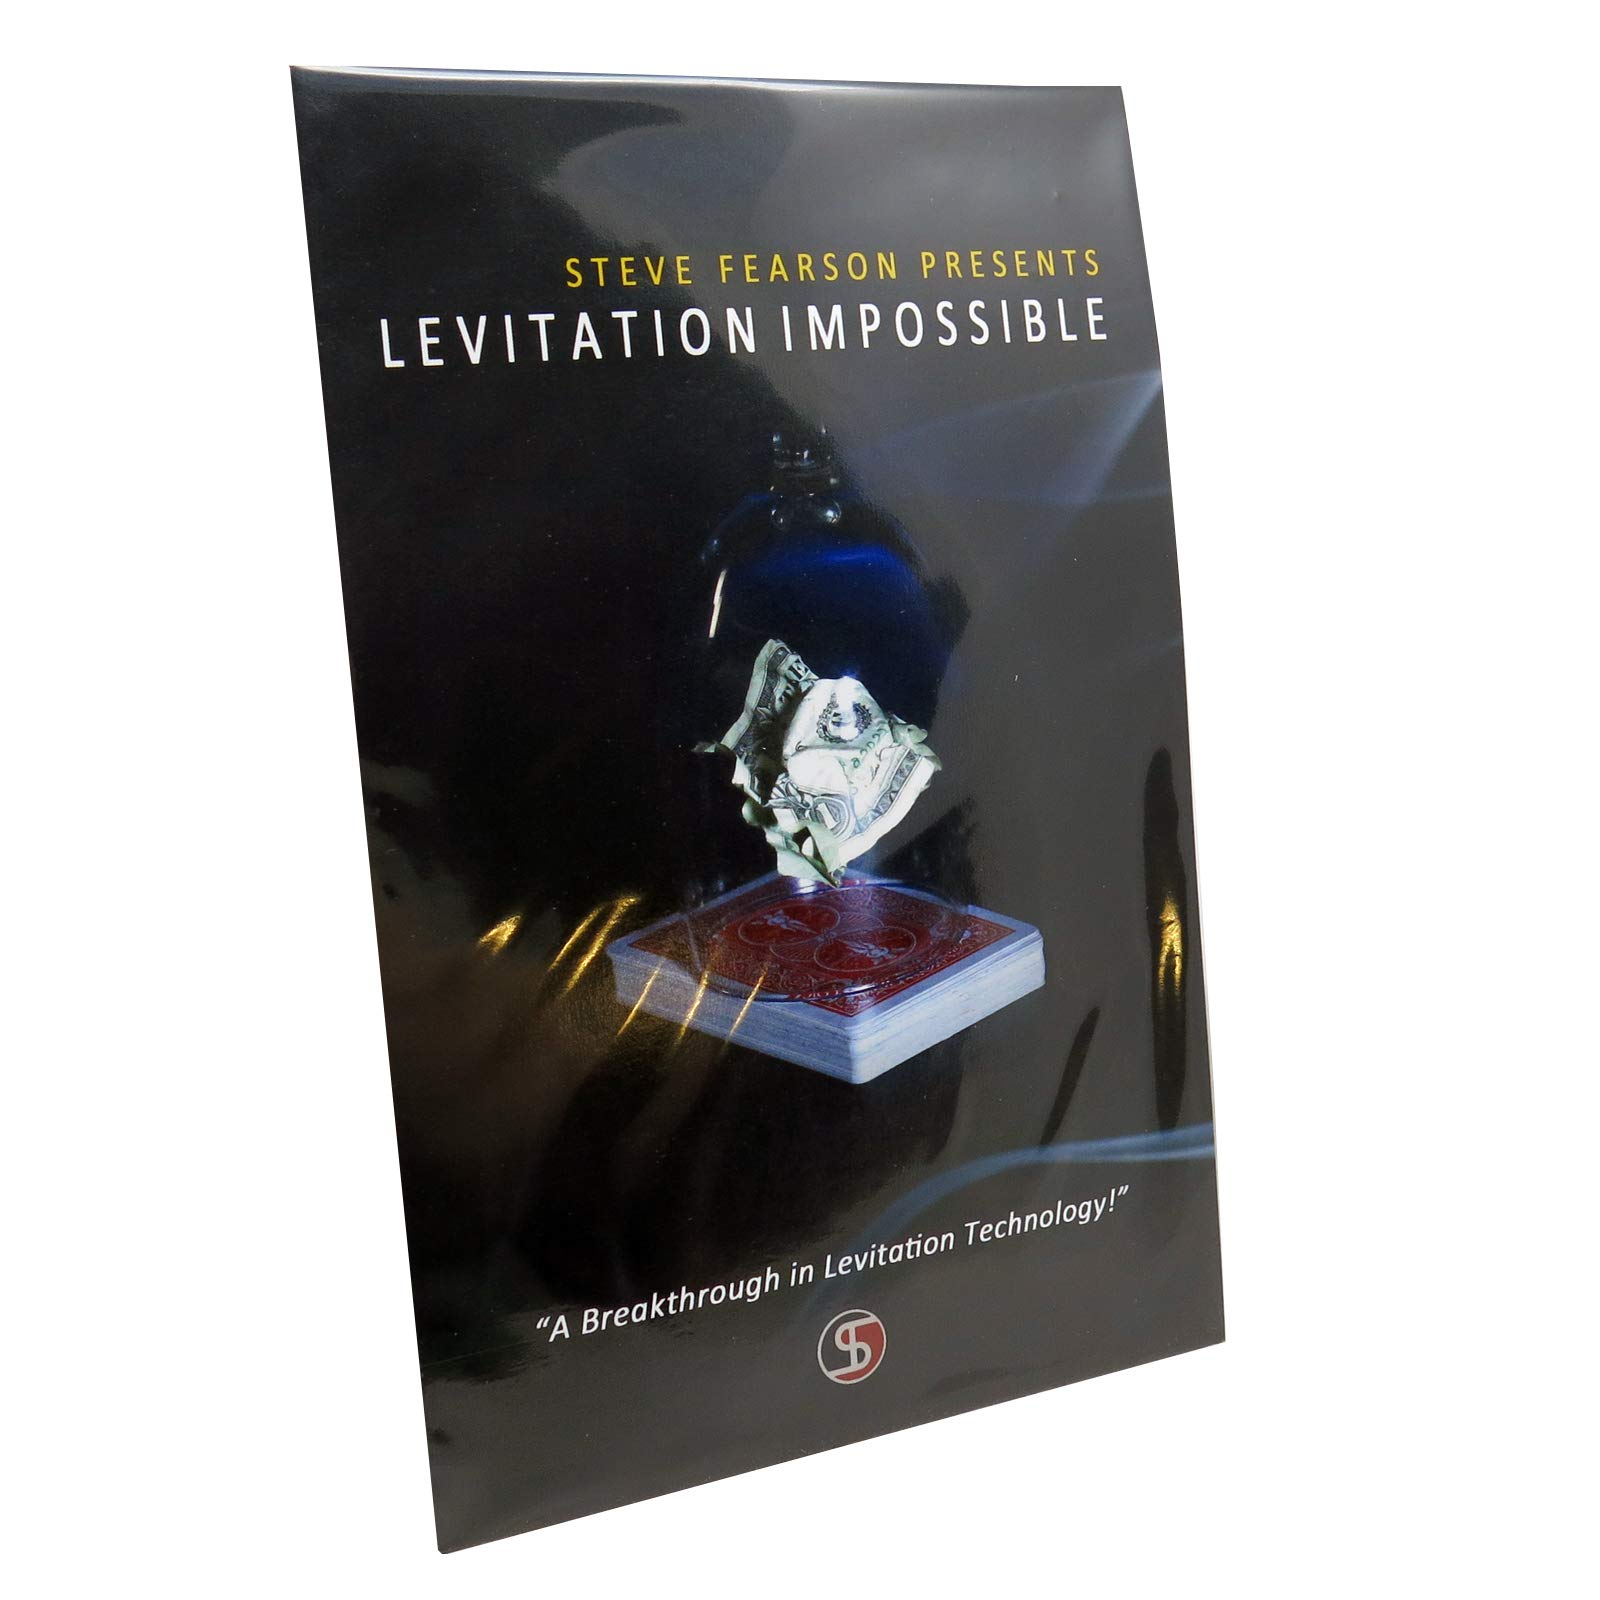 Steve Fearson Levitation Impossible